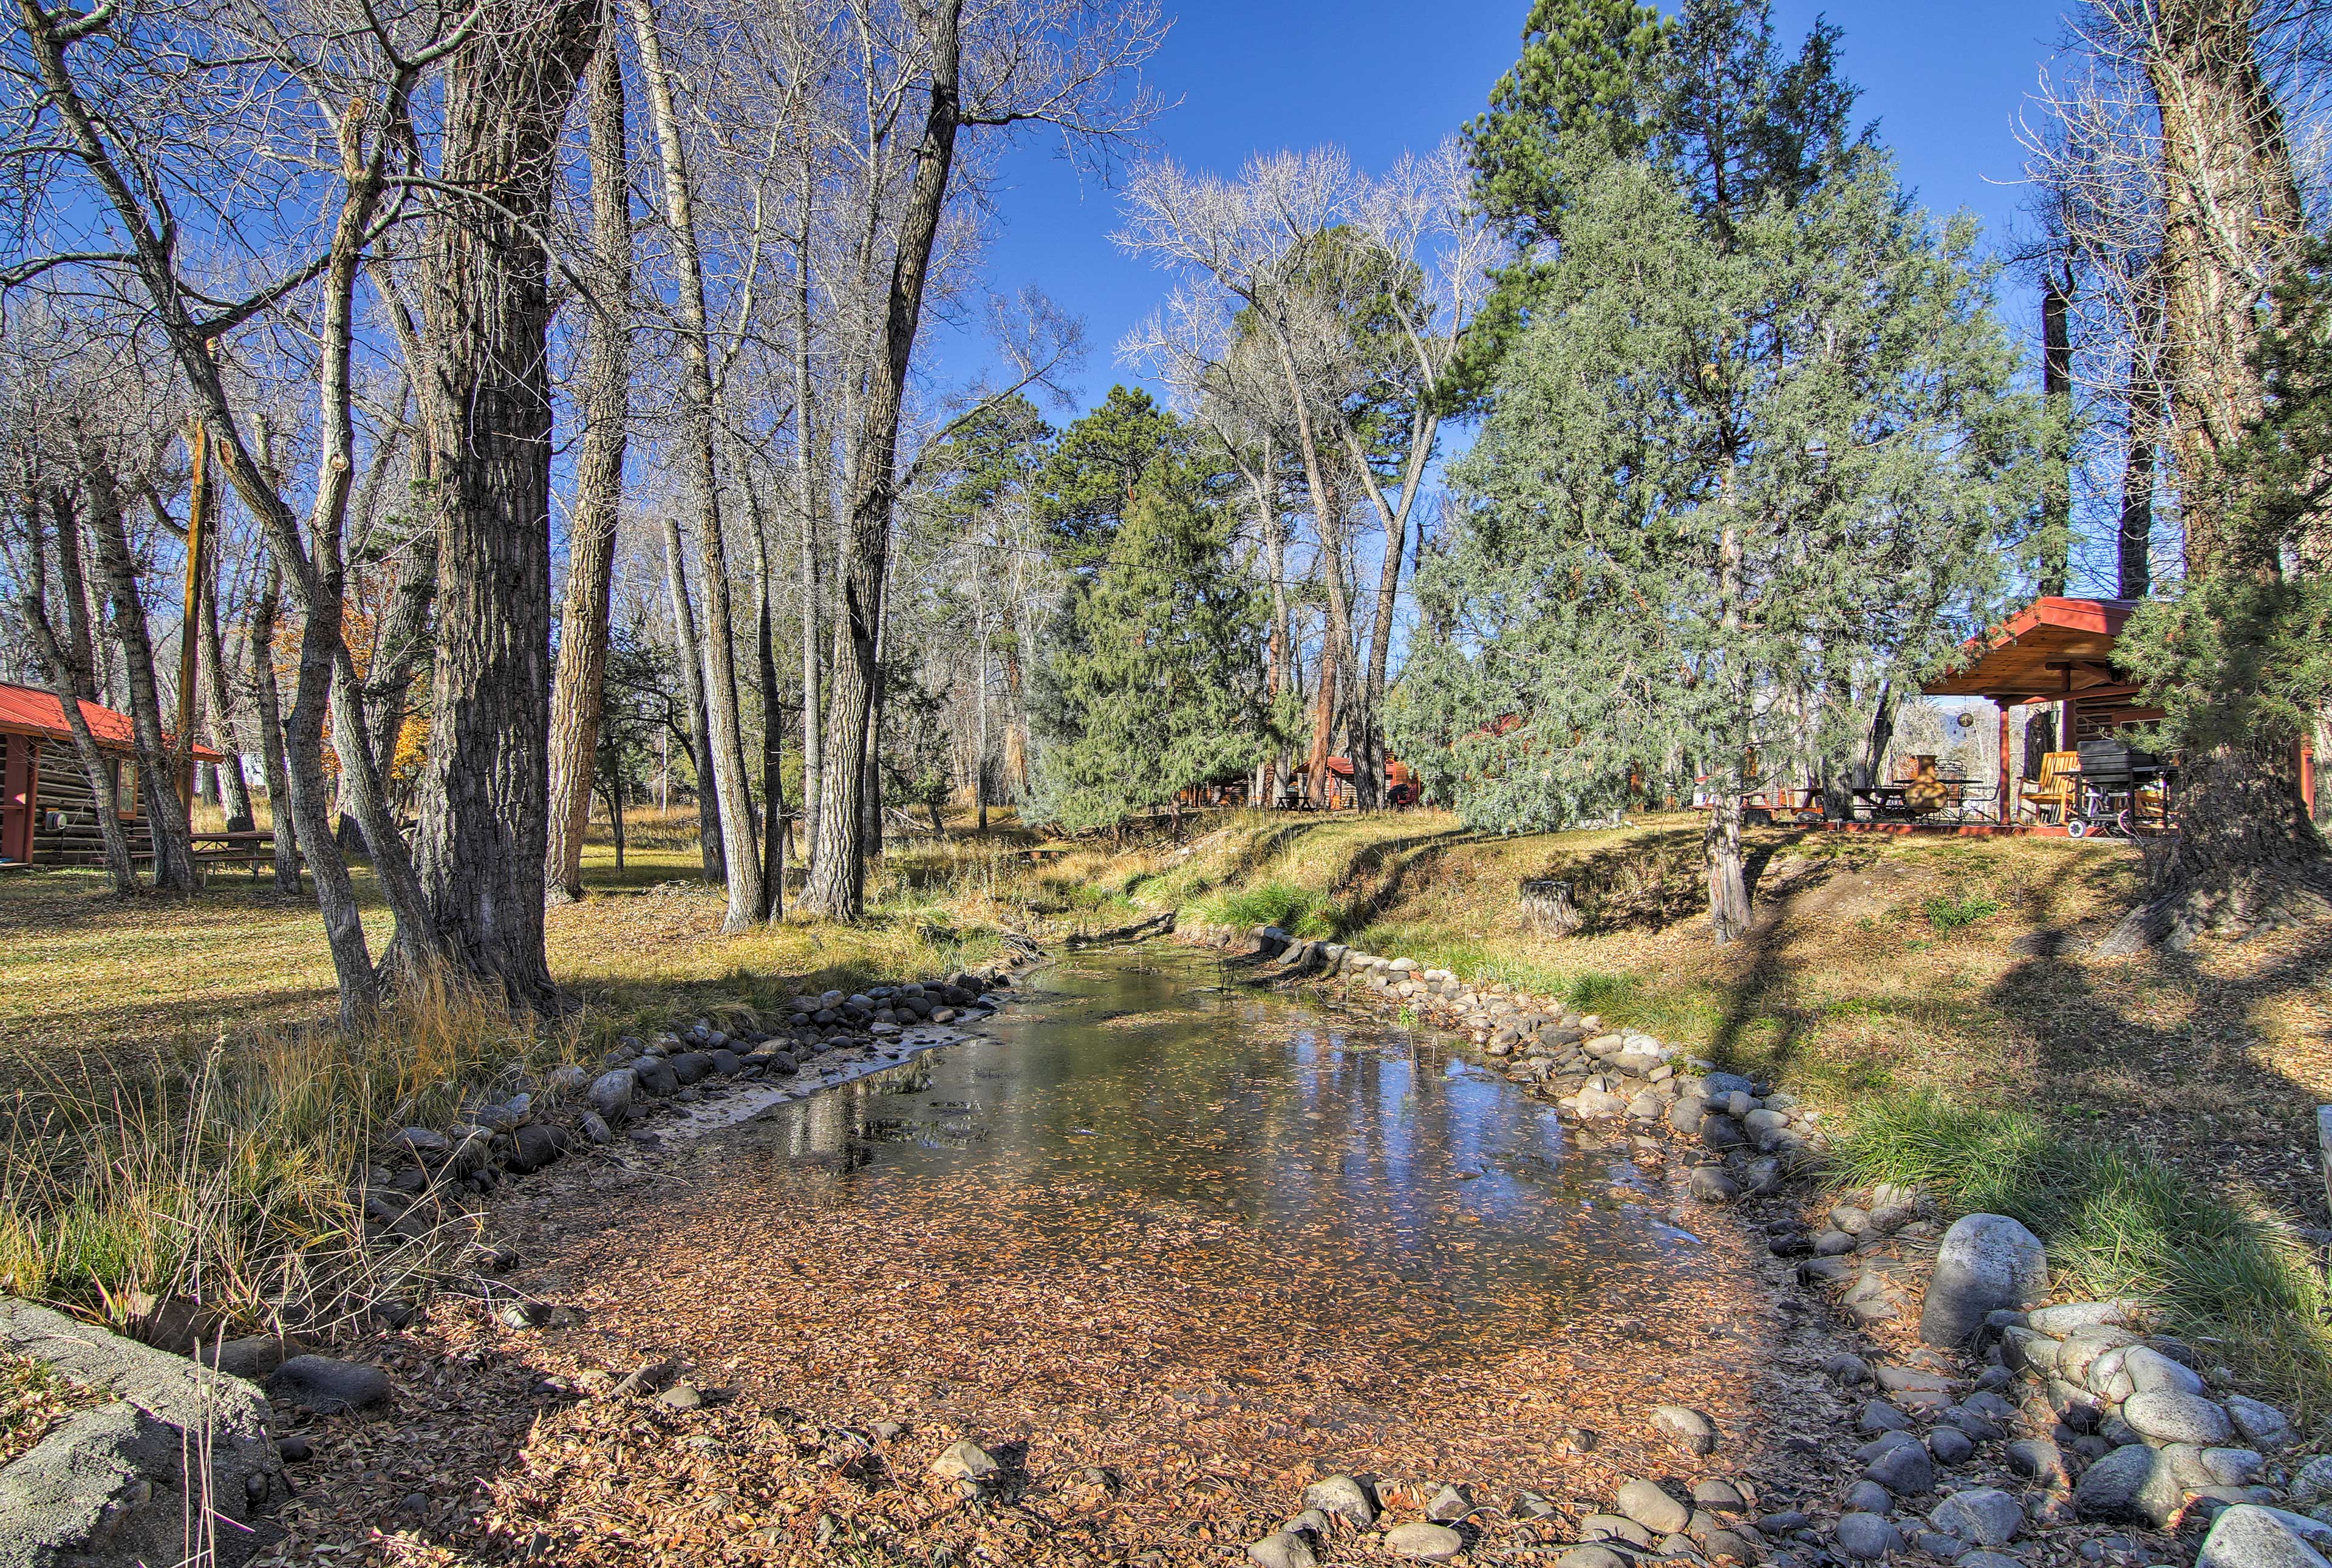 A babbling brook runs through the property.